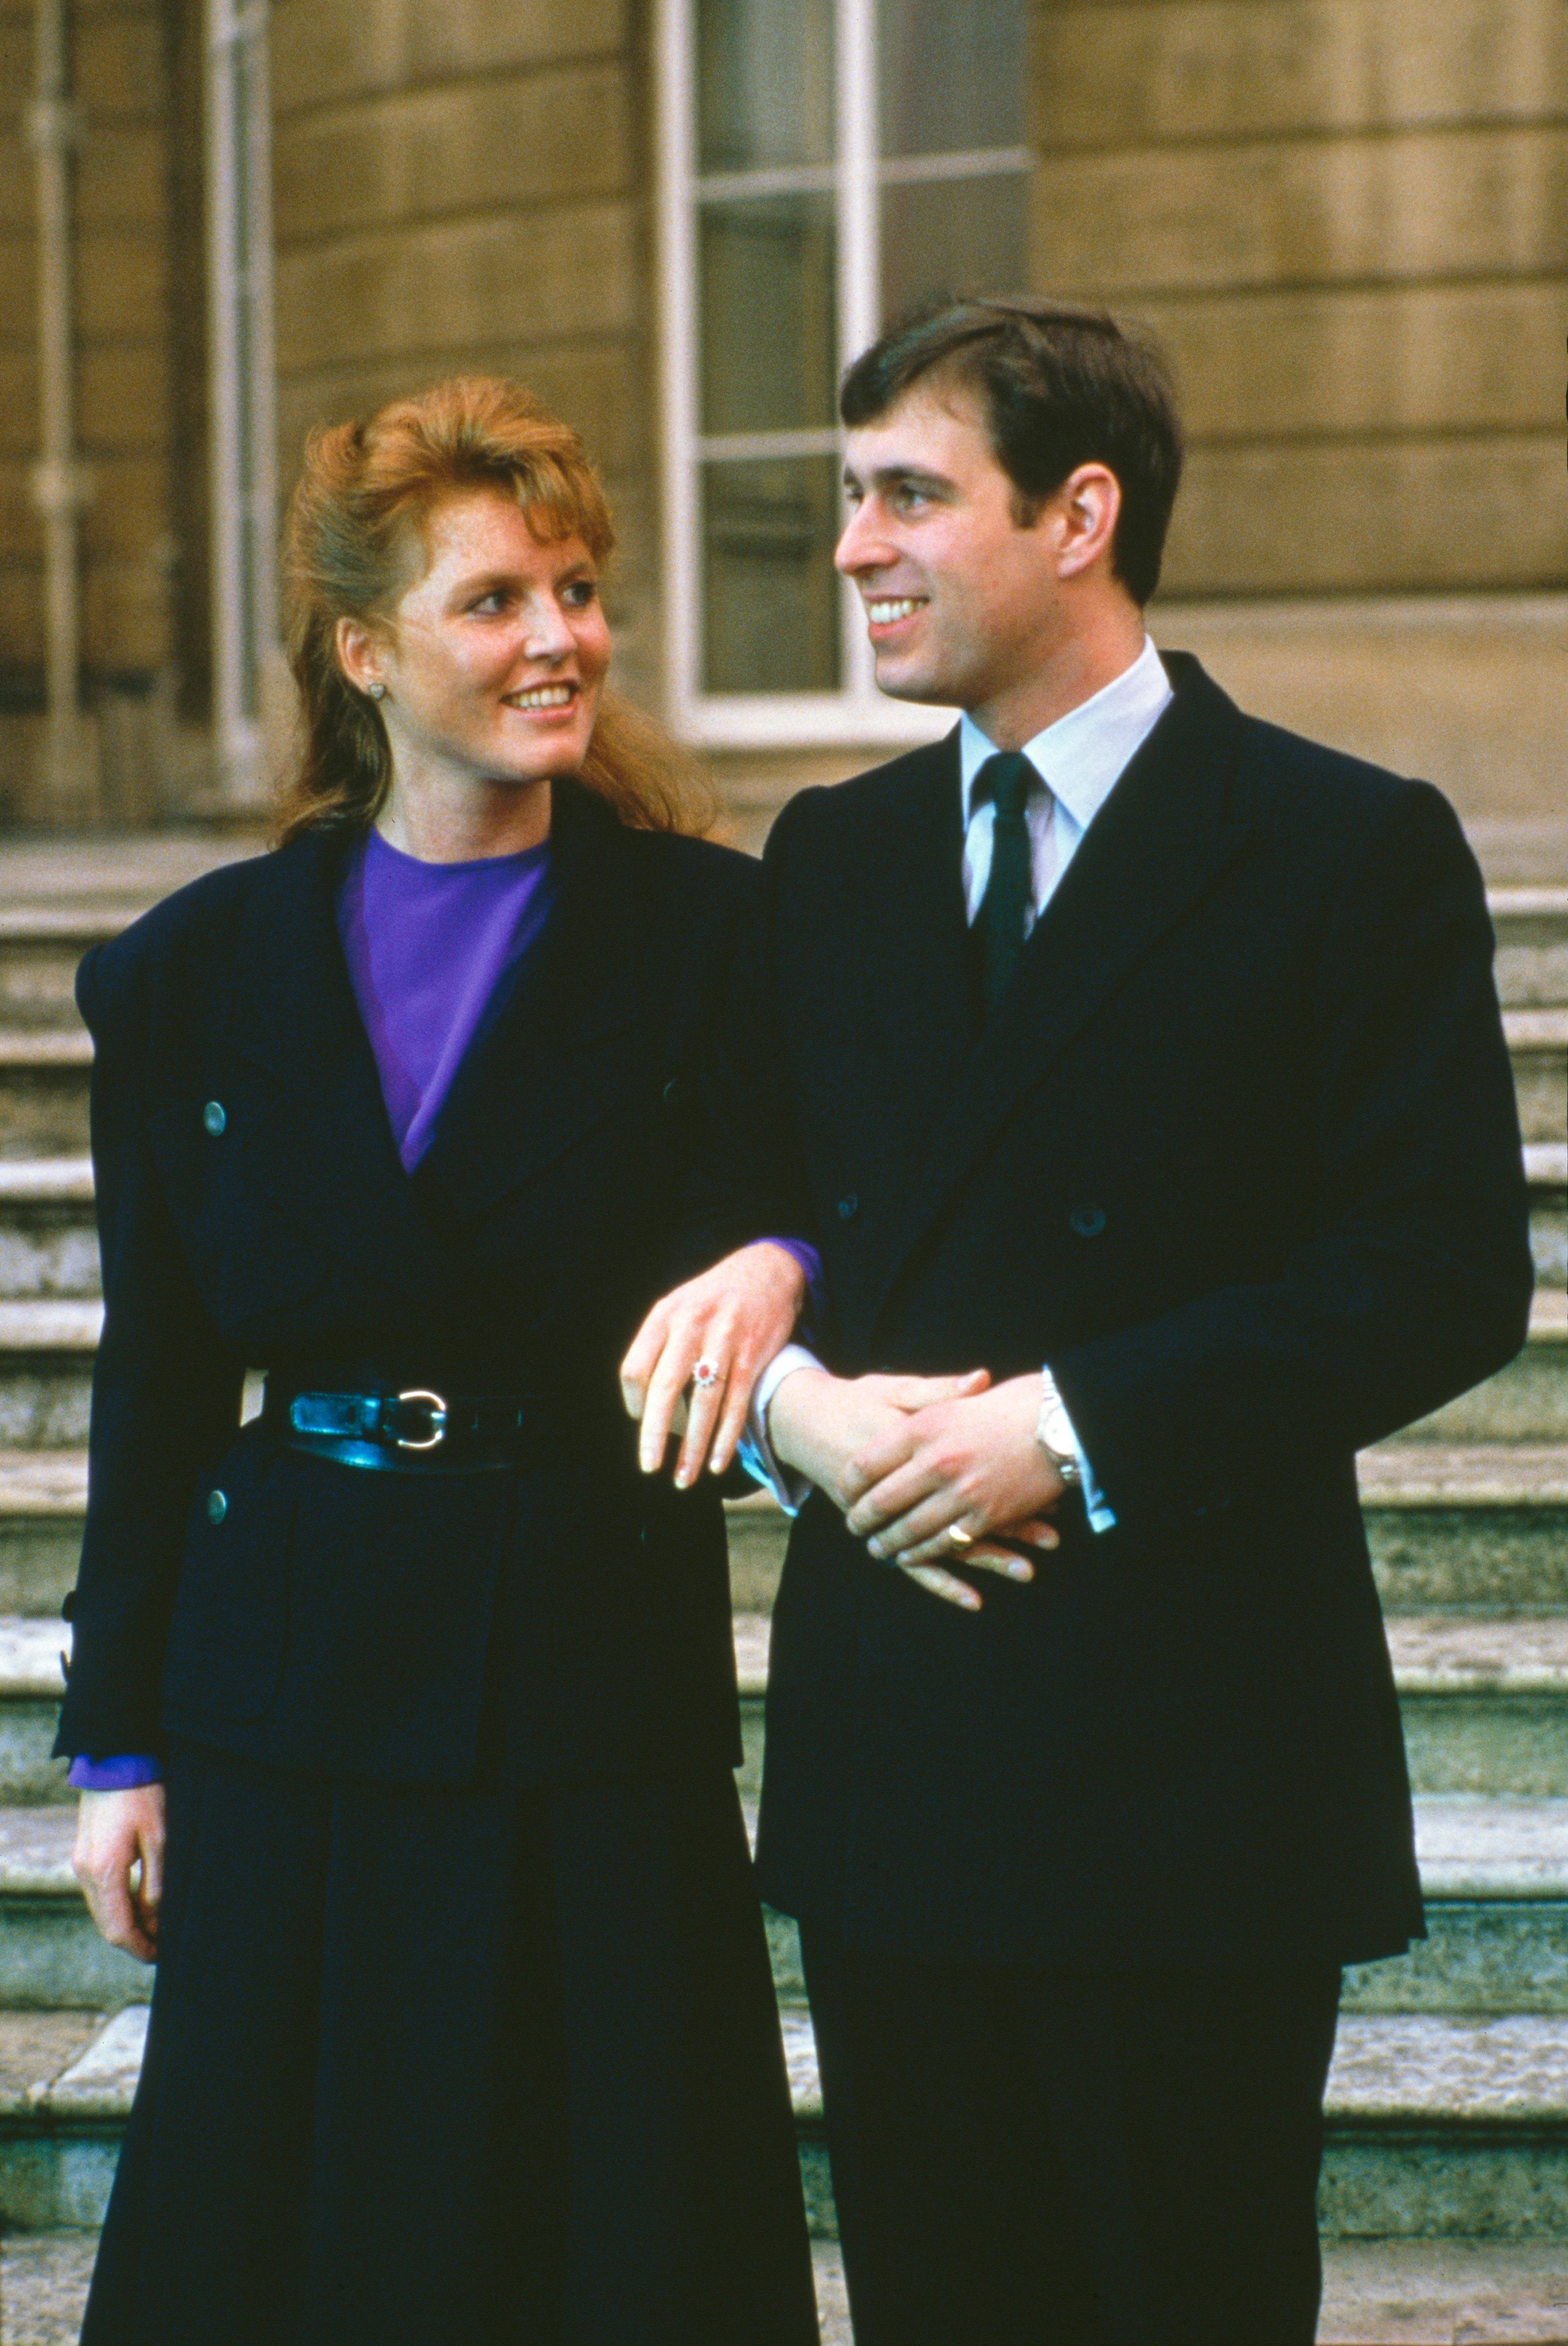 Prince Andrew and Sarah Ferguson engagement photo